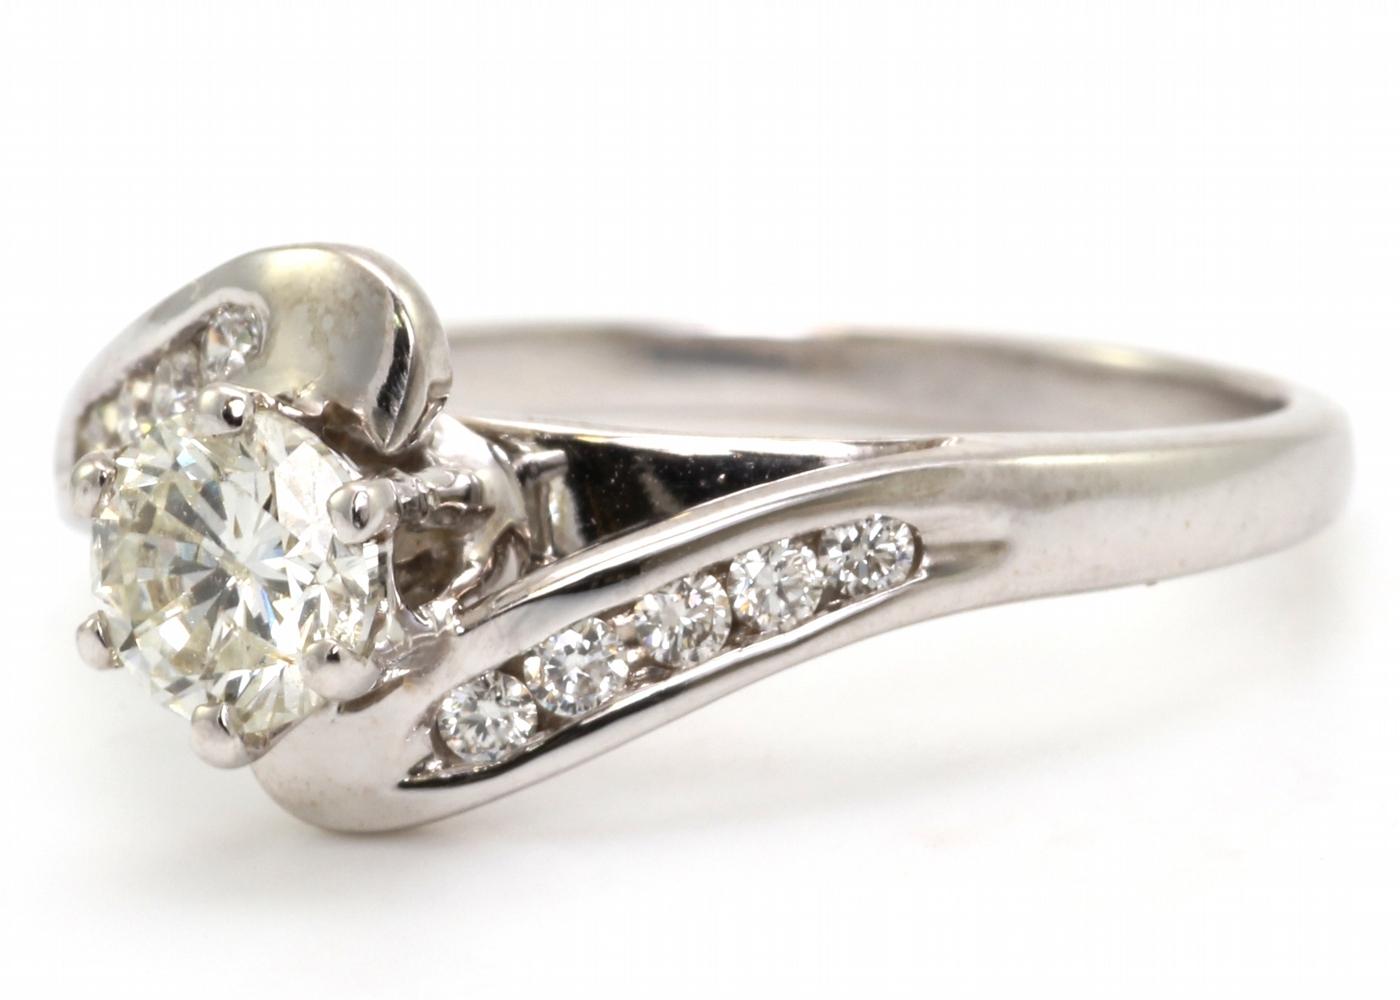 18k White Gold Single Stone Diamond Ring 0.65 Carats - Image 2 of 4